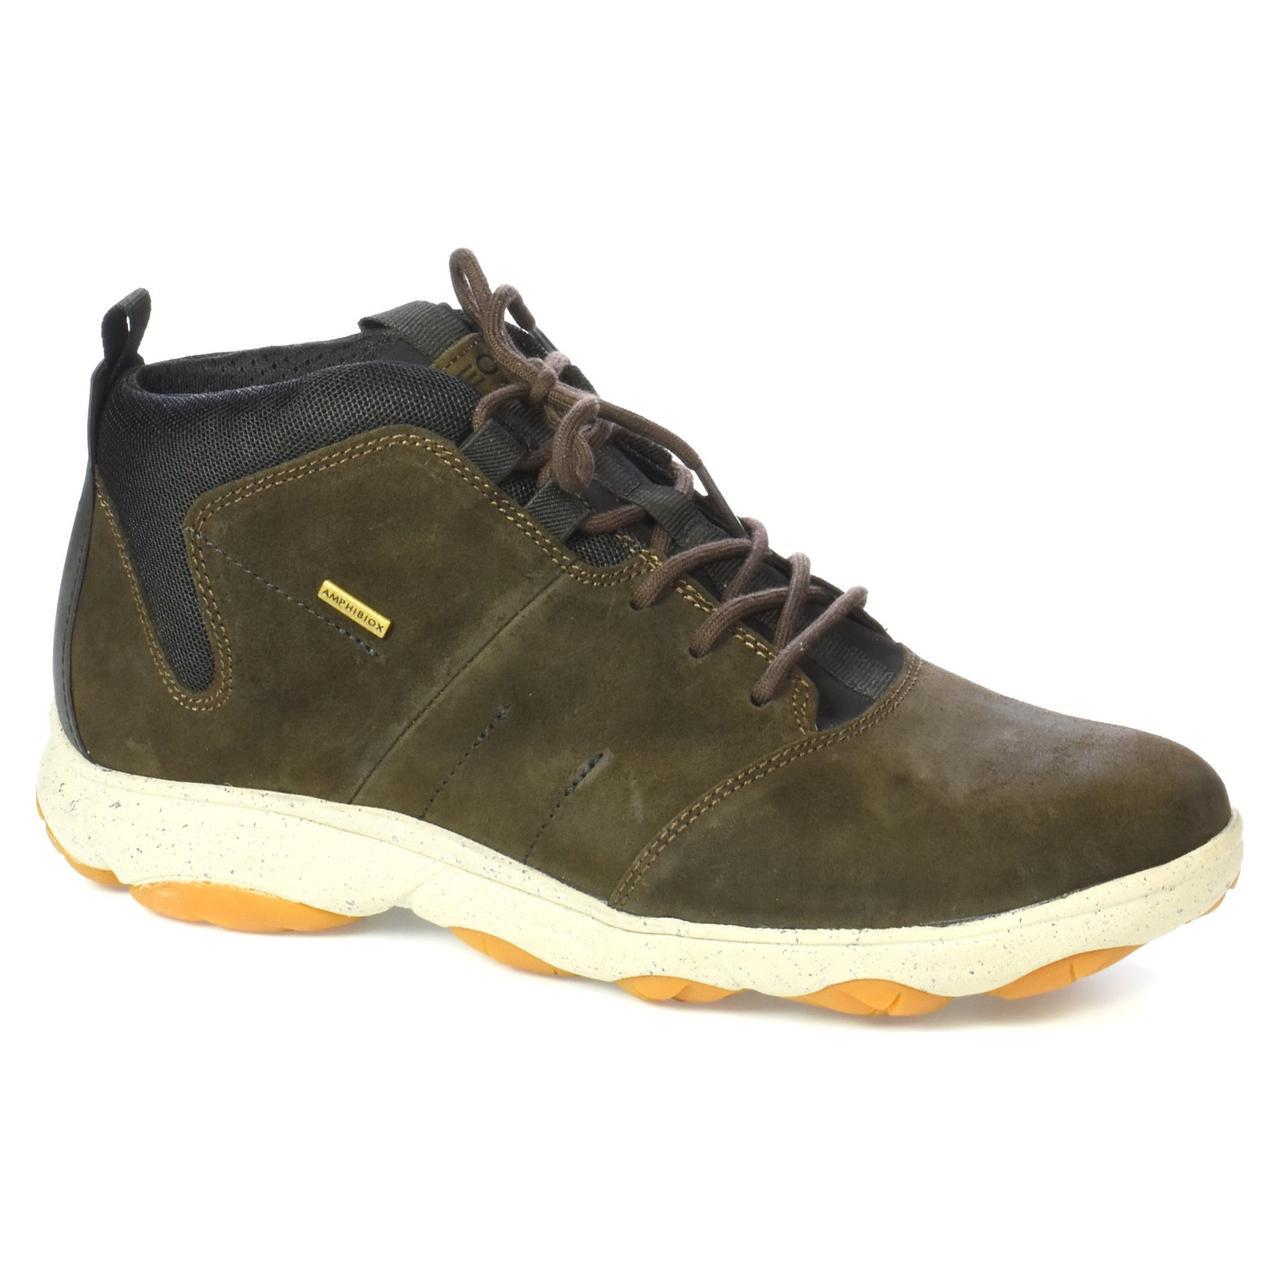 e05e2e608 Повседневные ботинки Geox Amphibiox U742VA-00023-C6004, код: 2856,  последний размер